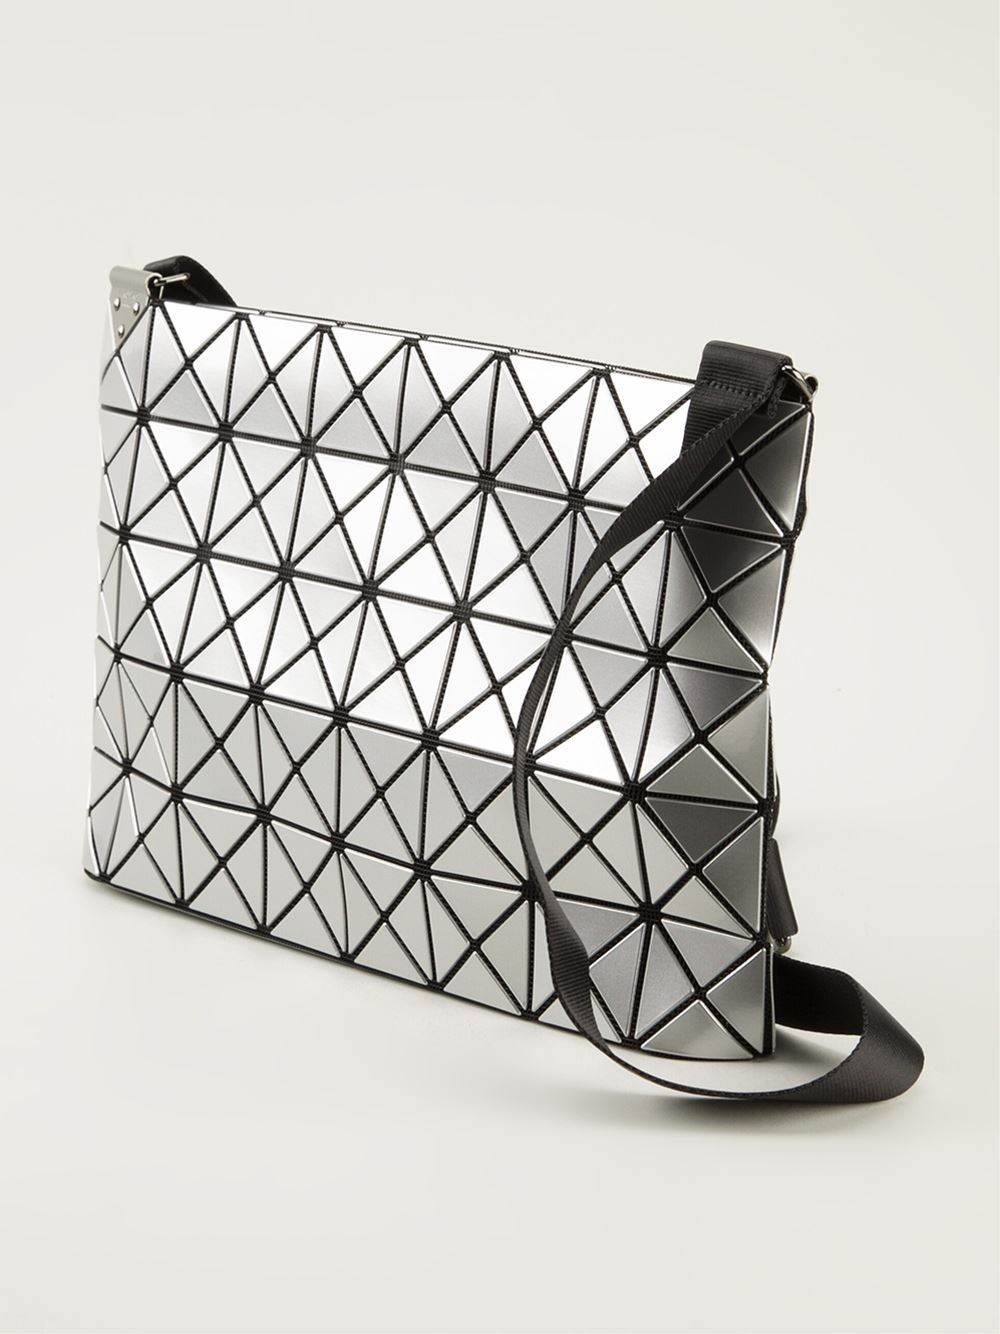 79184acf146b Lyst - Bao Bao Issey Miyake Prism Cross Body Bag in Metallic